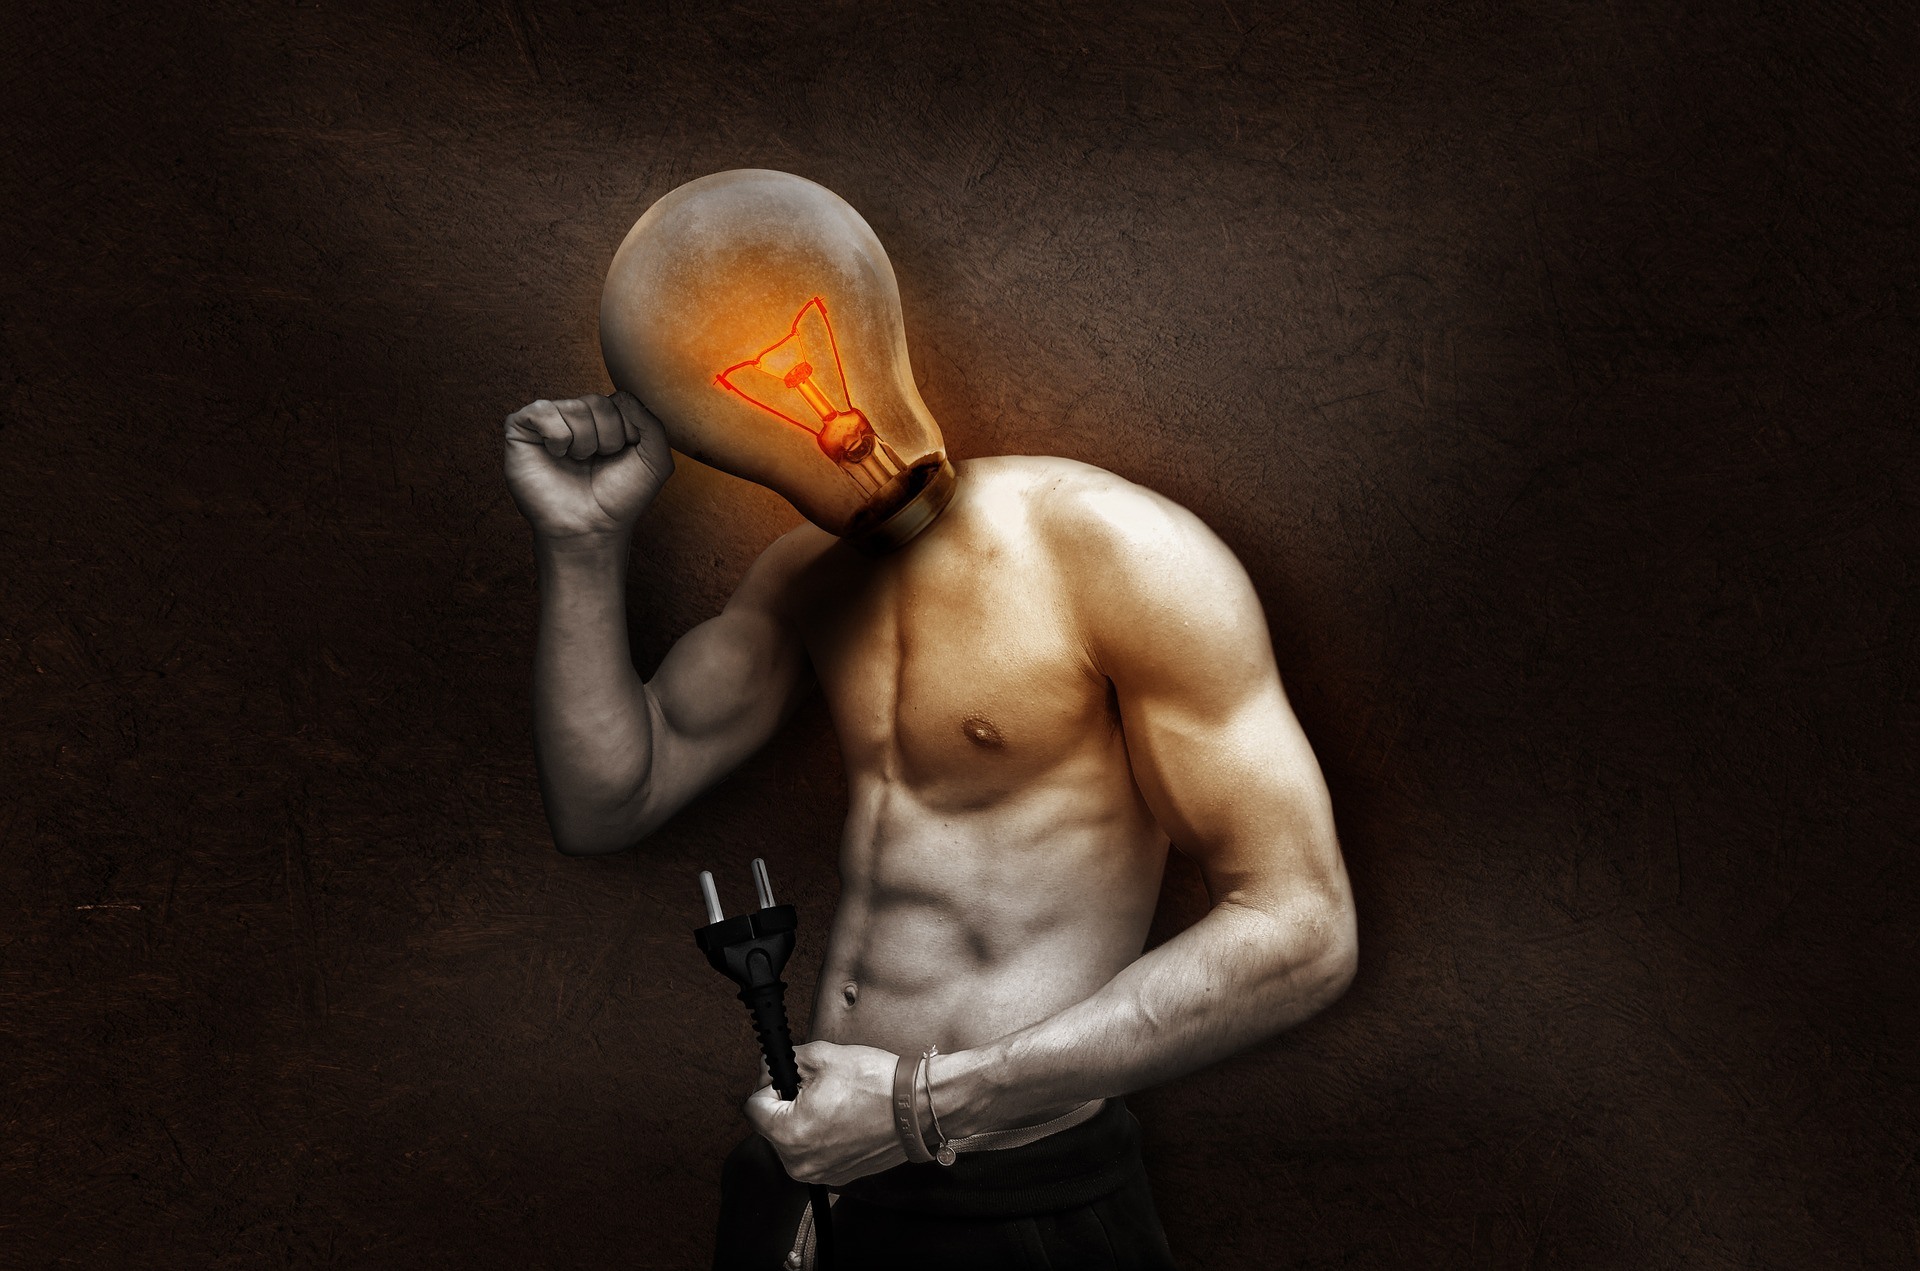 perte d'énergie